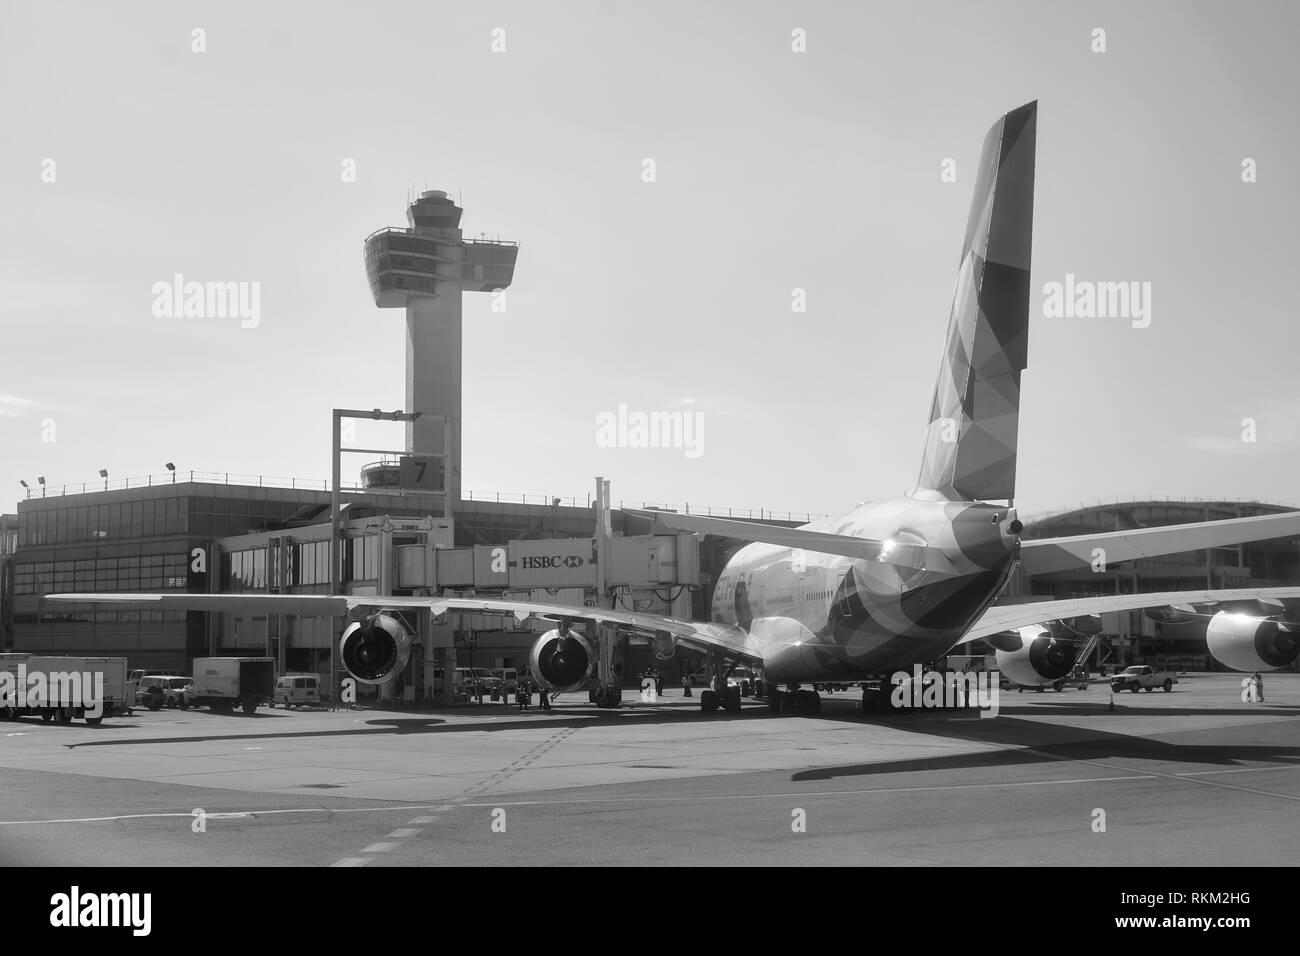 NEW YORK - MARCH 22, 2016: passenger jet airplane docked at JFK Airport. John F. Kennedy International Airport is a major international airport locate - Stock Image